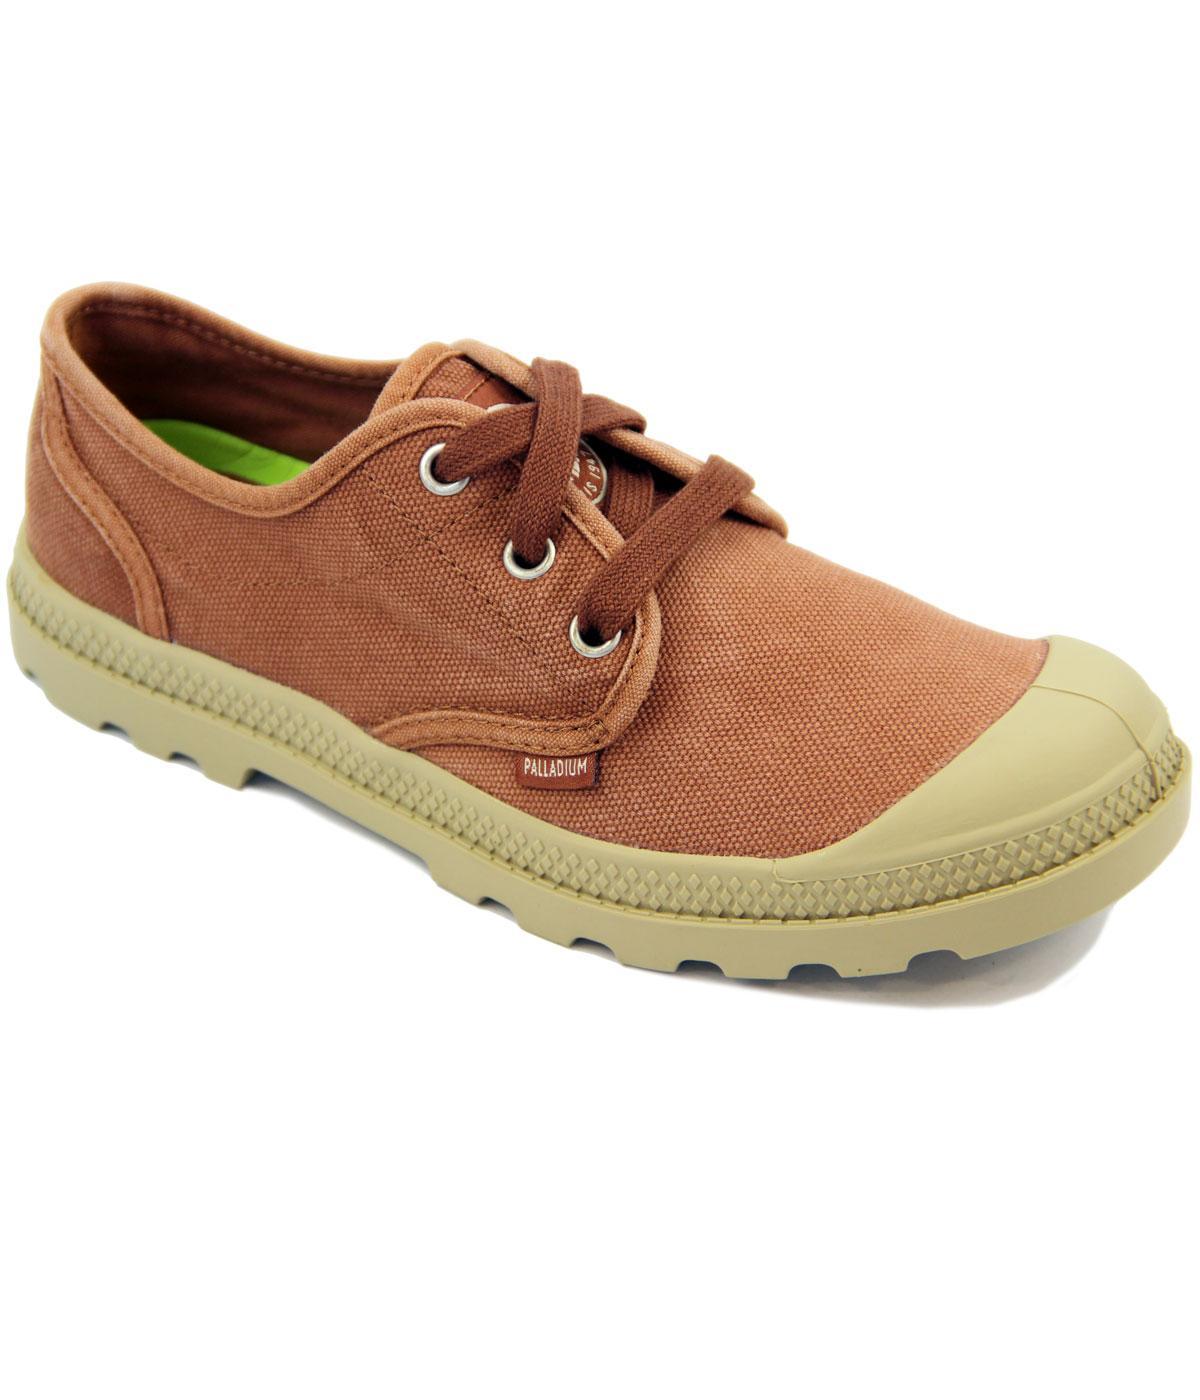 Pampa Oxford PALLADIUM Retro Canvas Shoes (B/P)